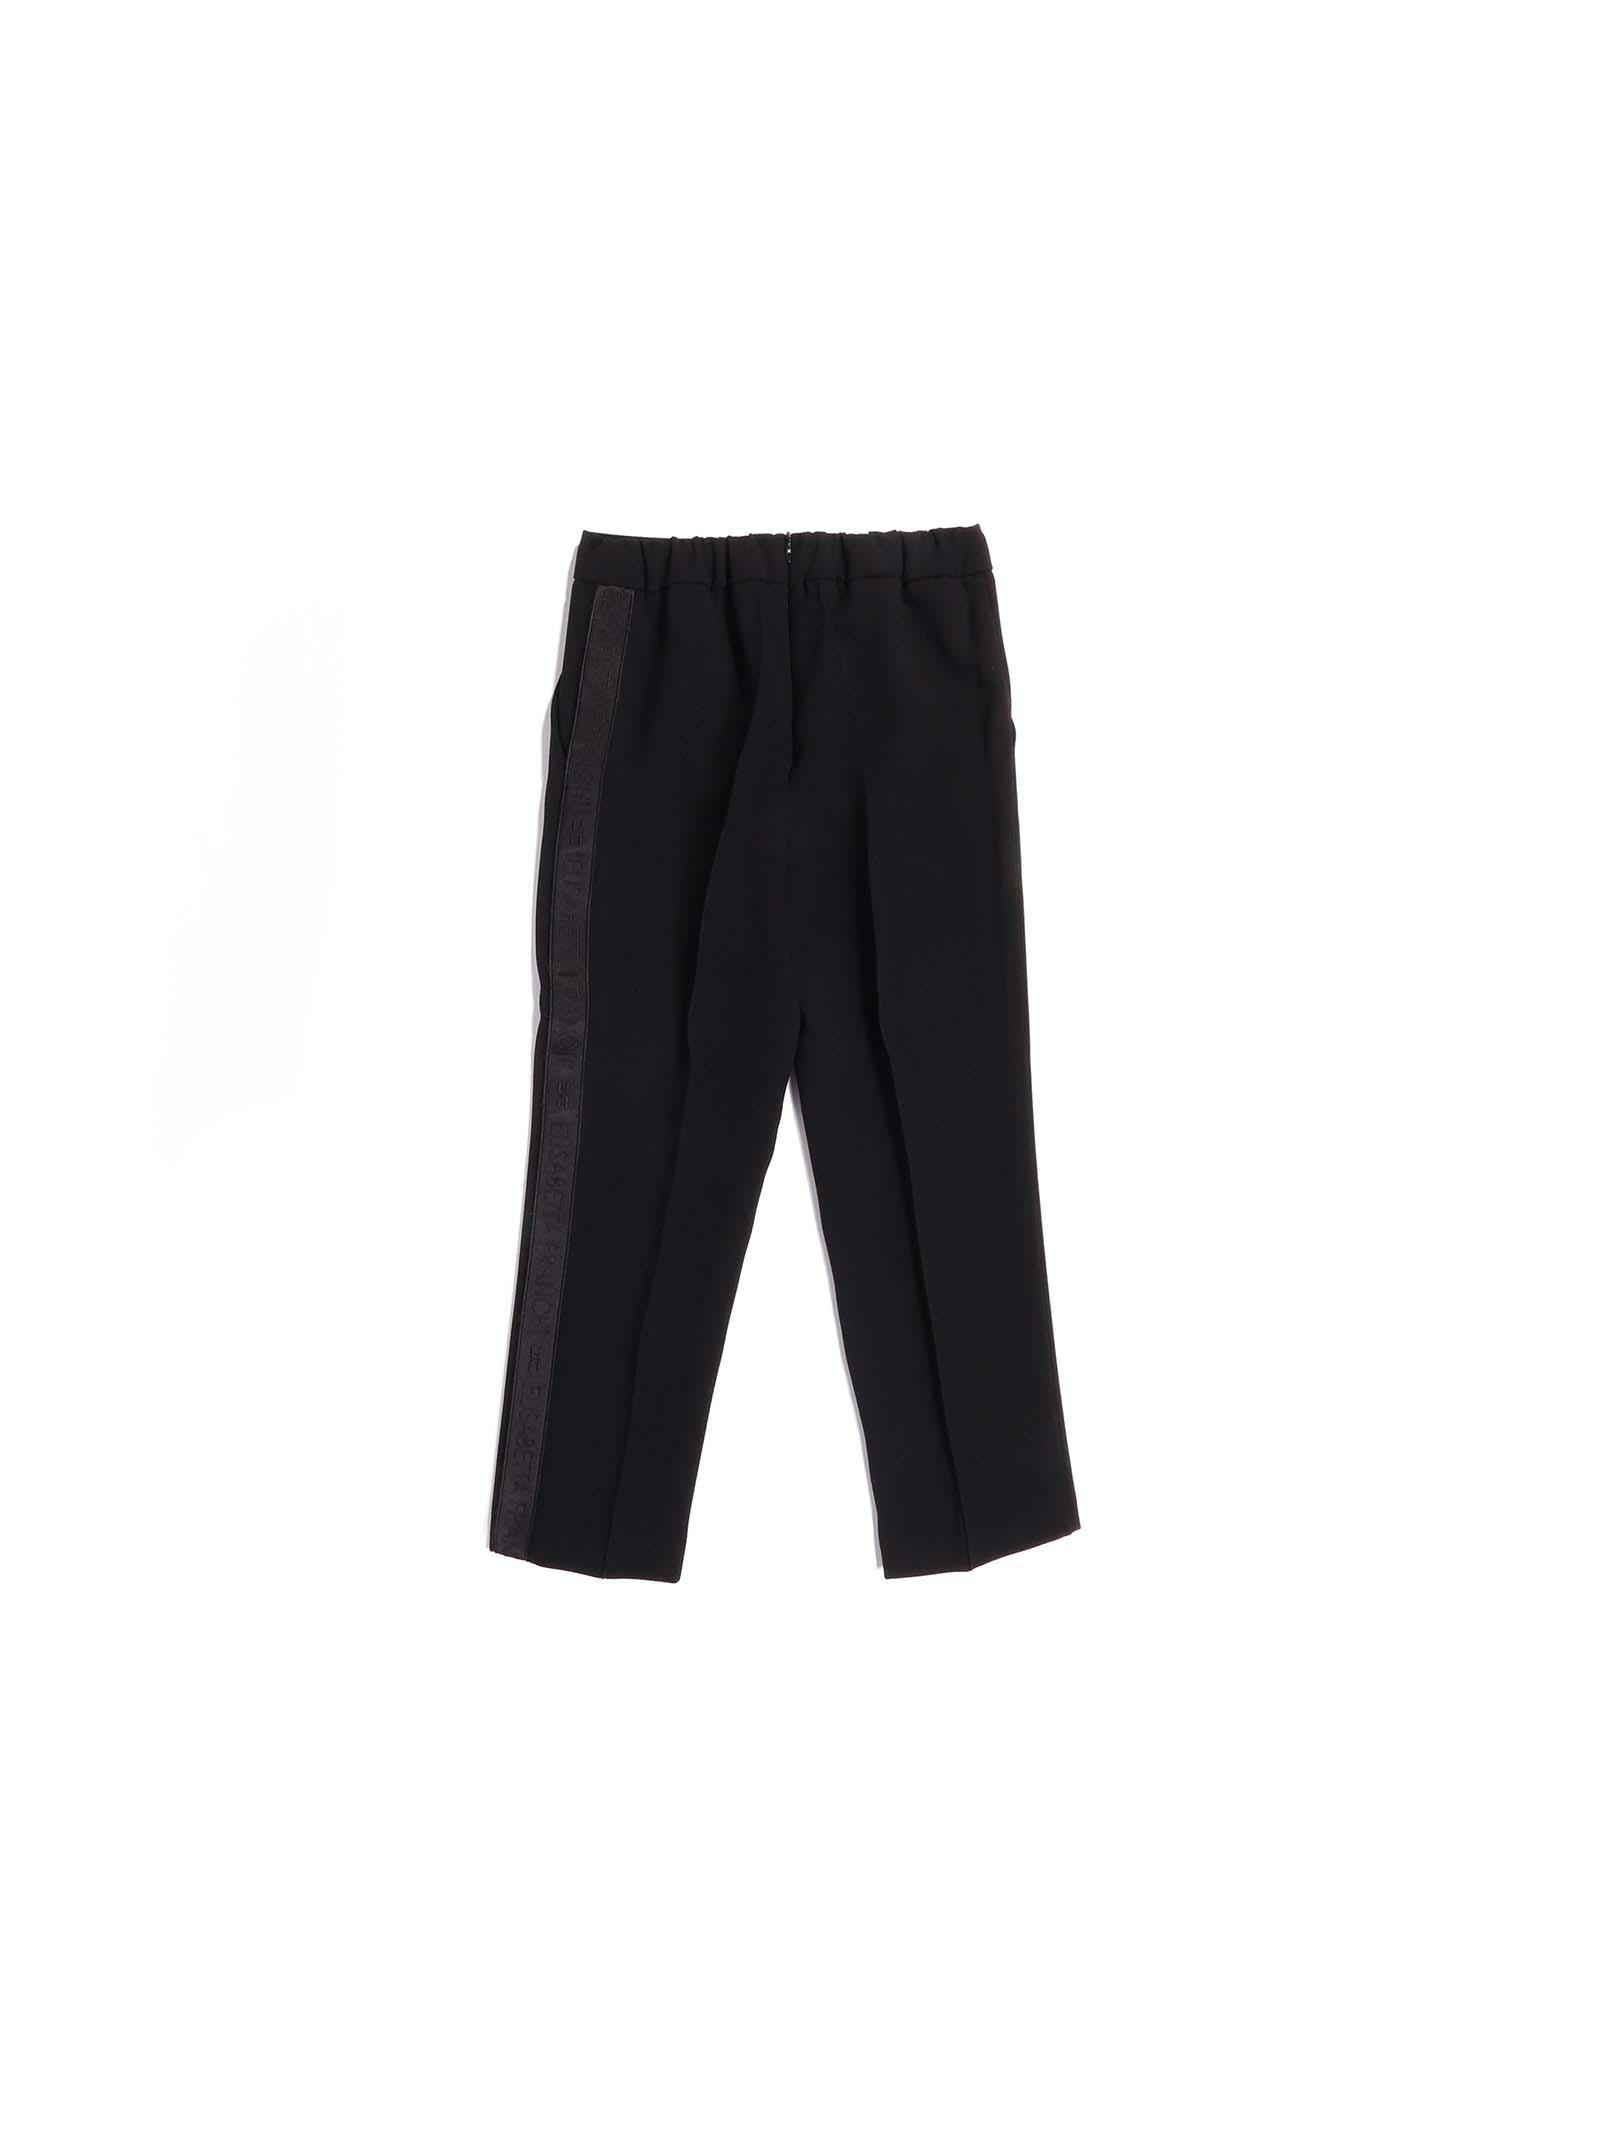 pantalone nero con banda laterale Elisabetta Franchi   Pantalone   EFPA95-GA85-ZE0220076